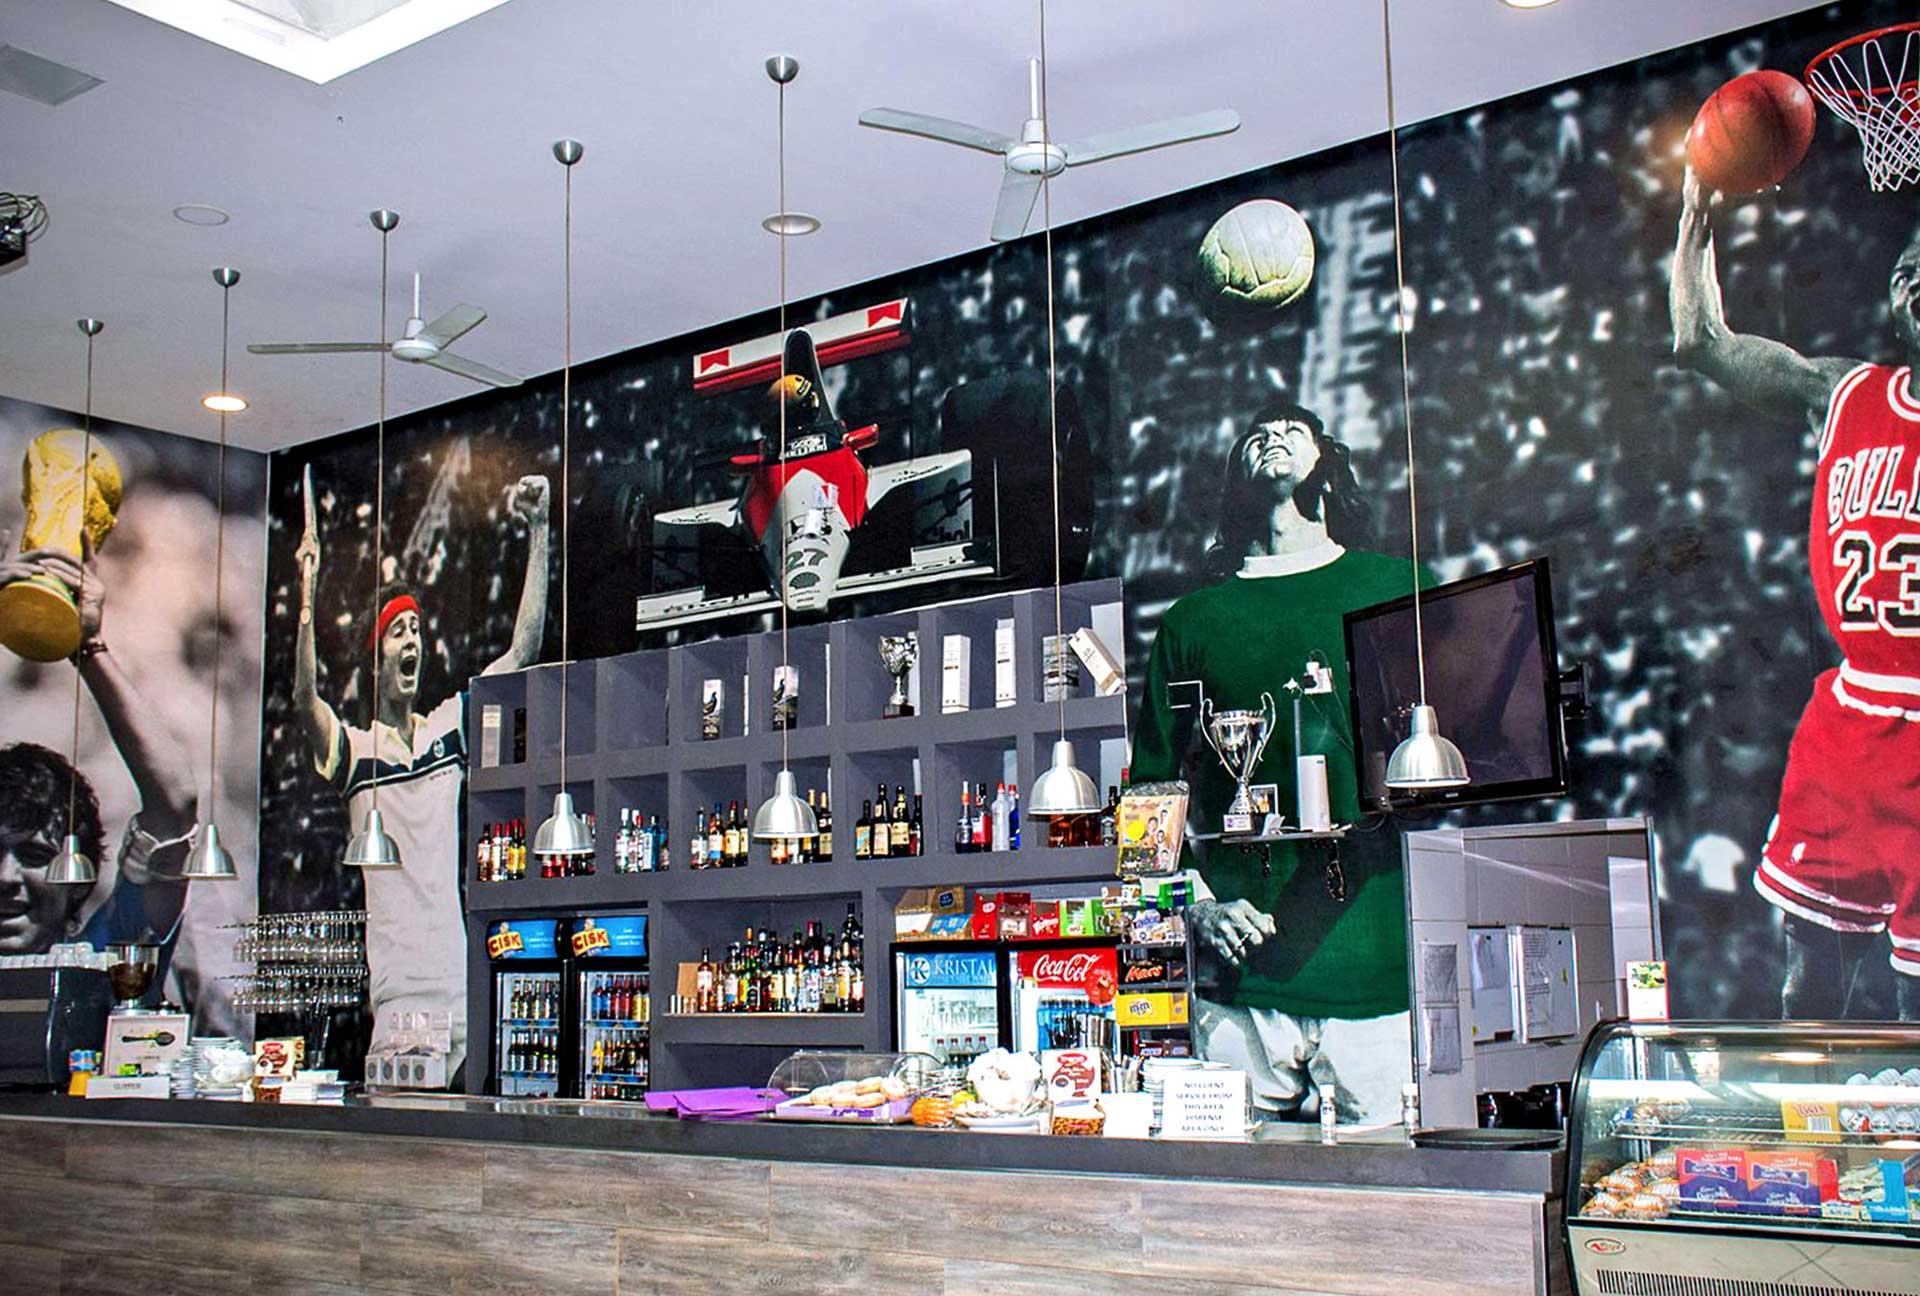 Wallpaper - Sports Bar Wallpaper Artwork